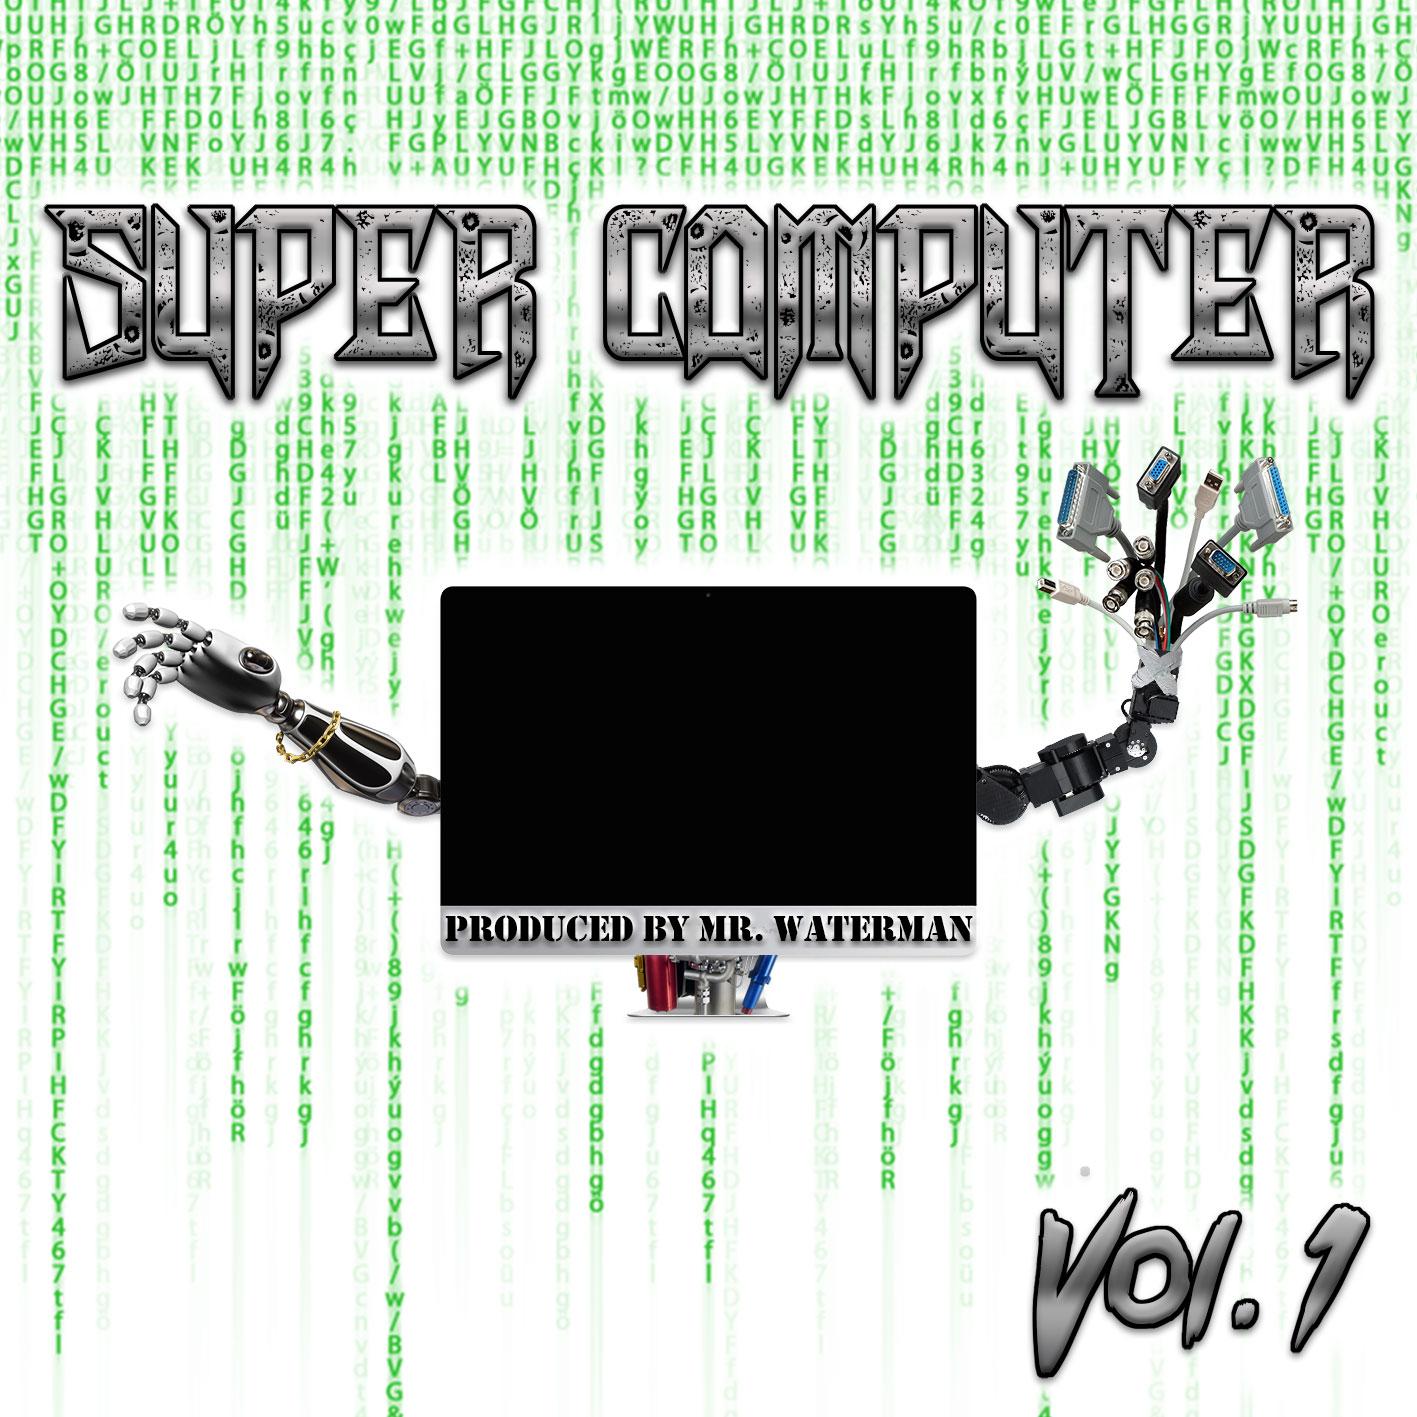 Super-CPU---Waterman.jpg